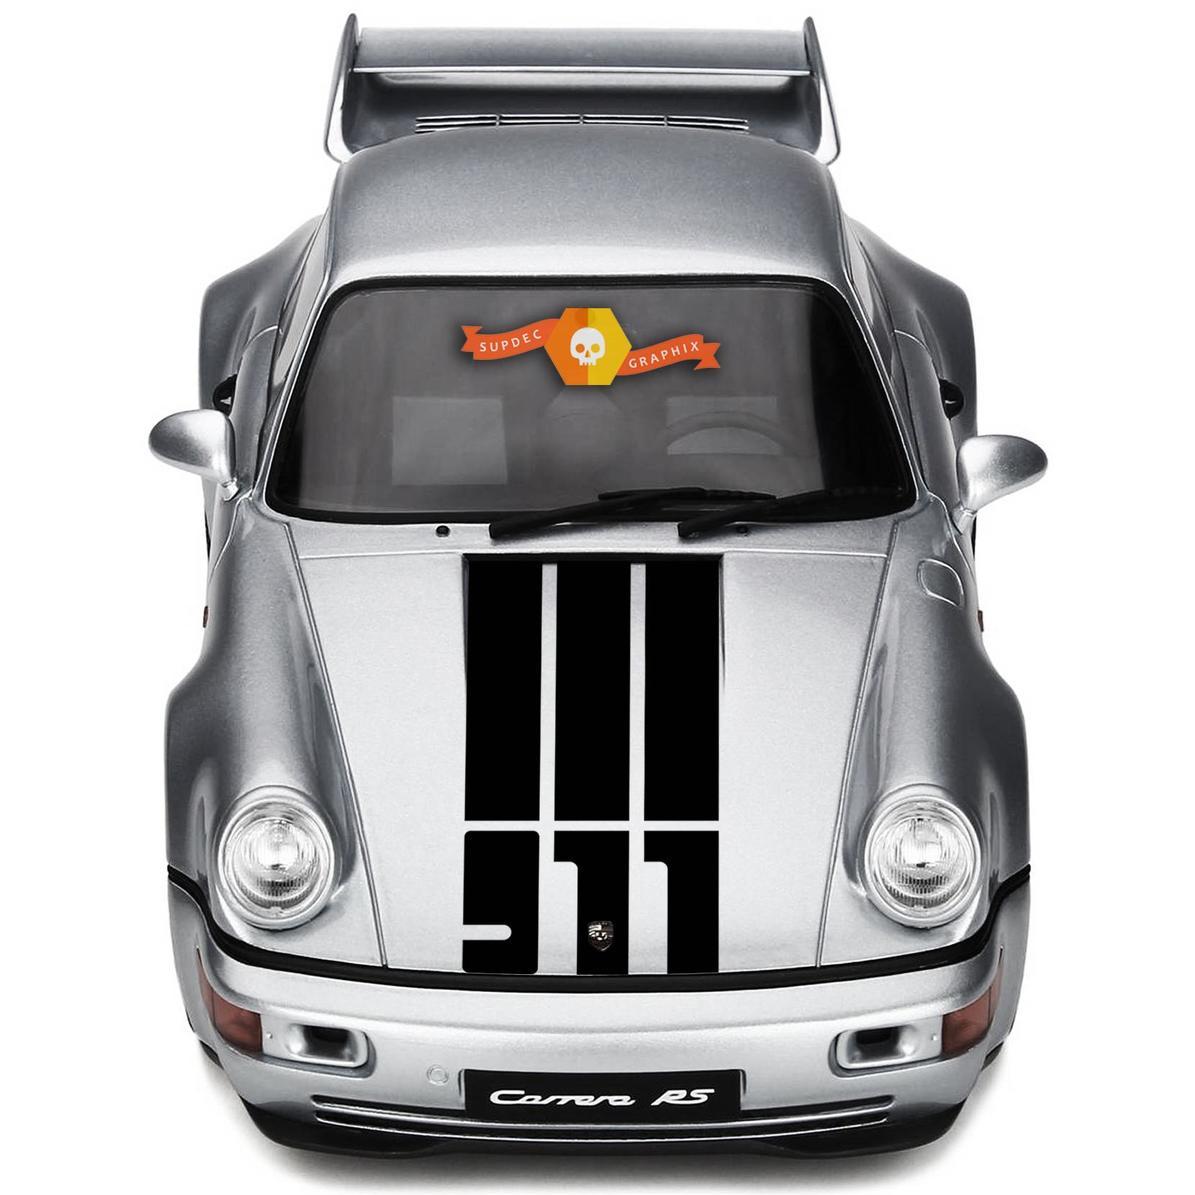 Porsche 911 Hood Central 3 Stripes And 911 Logo Decal Sticker